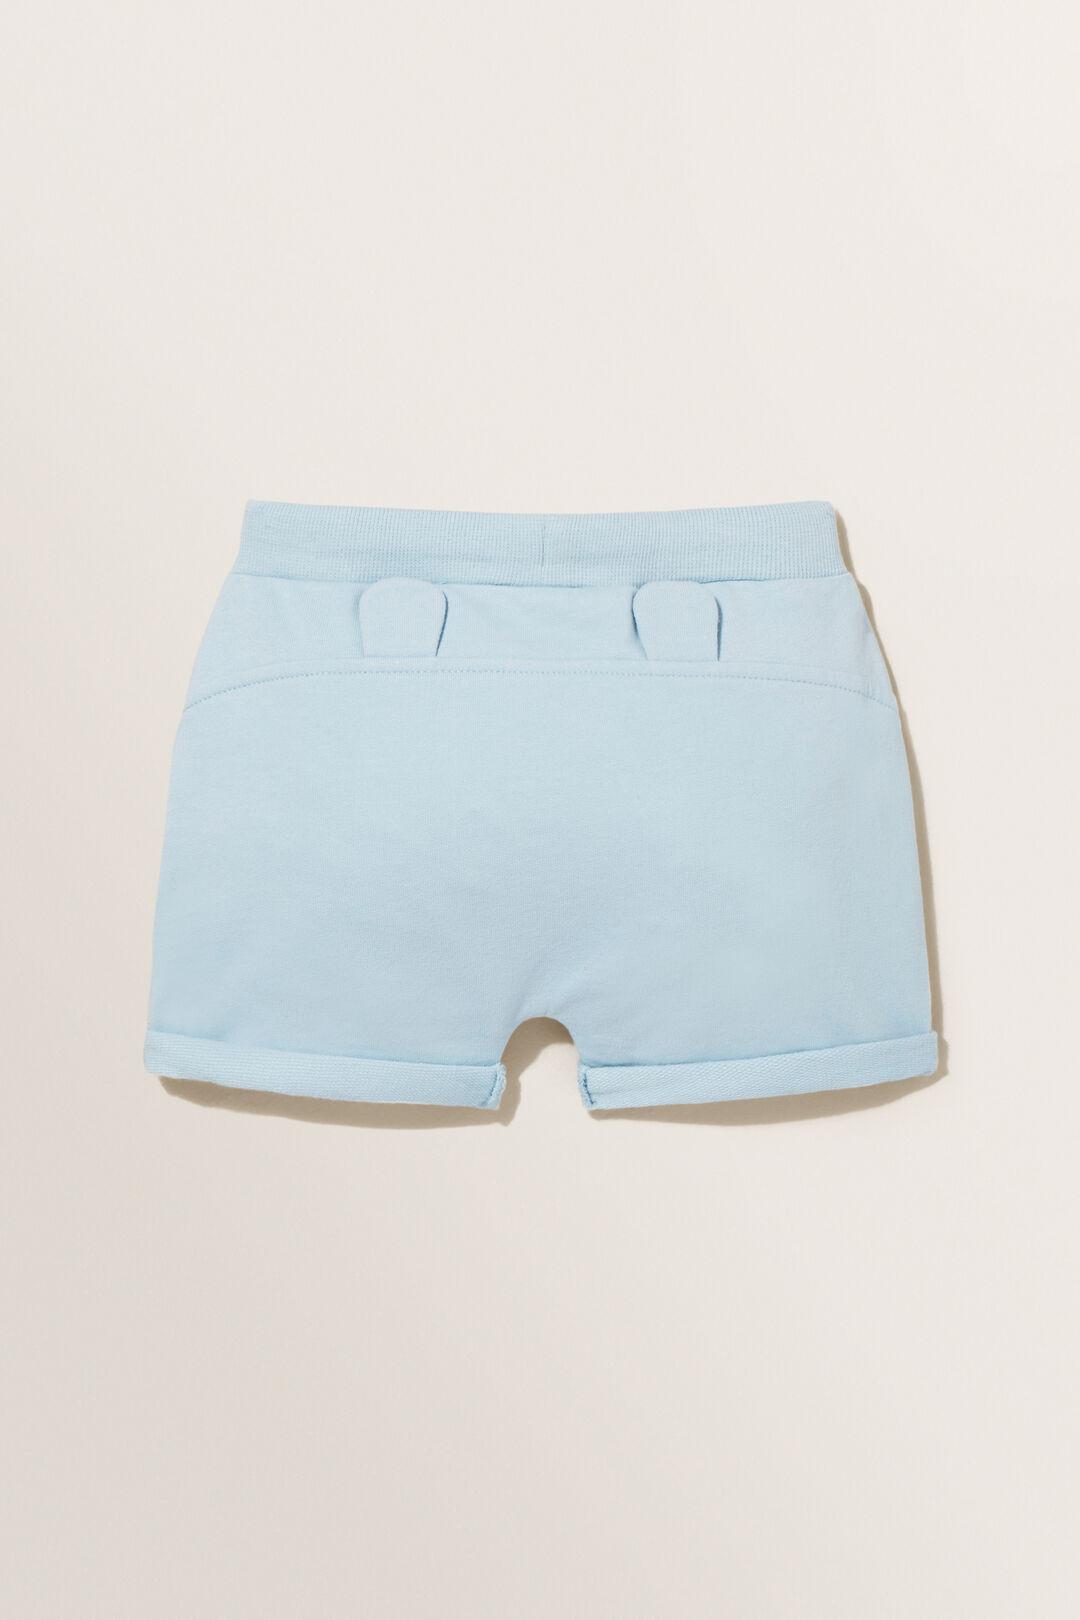 Basic Track Shorts  Pale Blue  hi-res